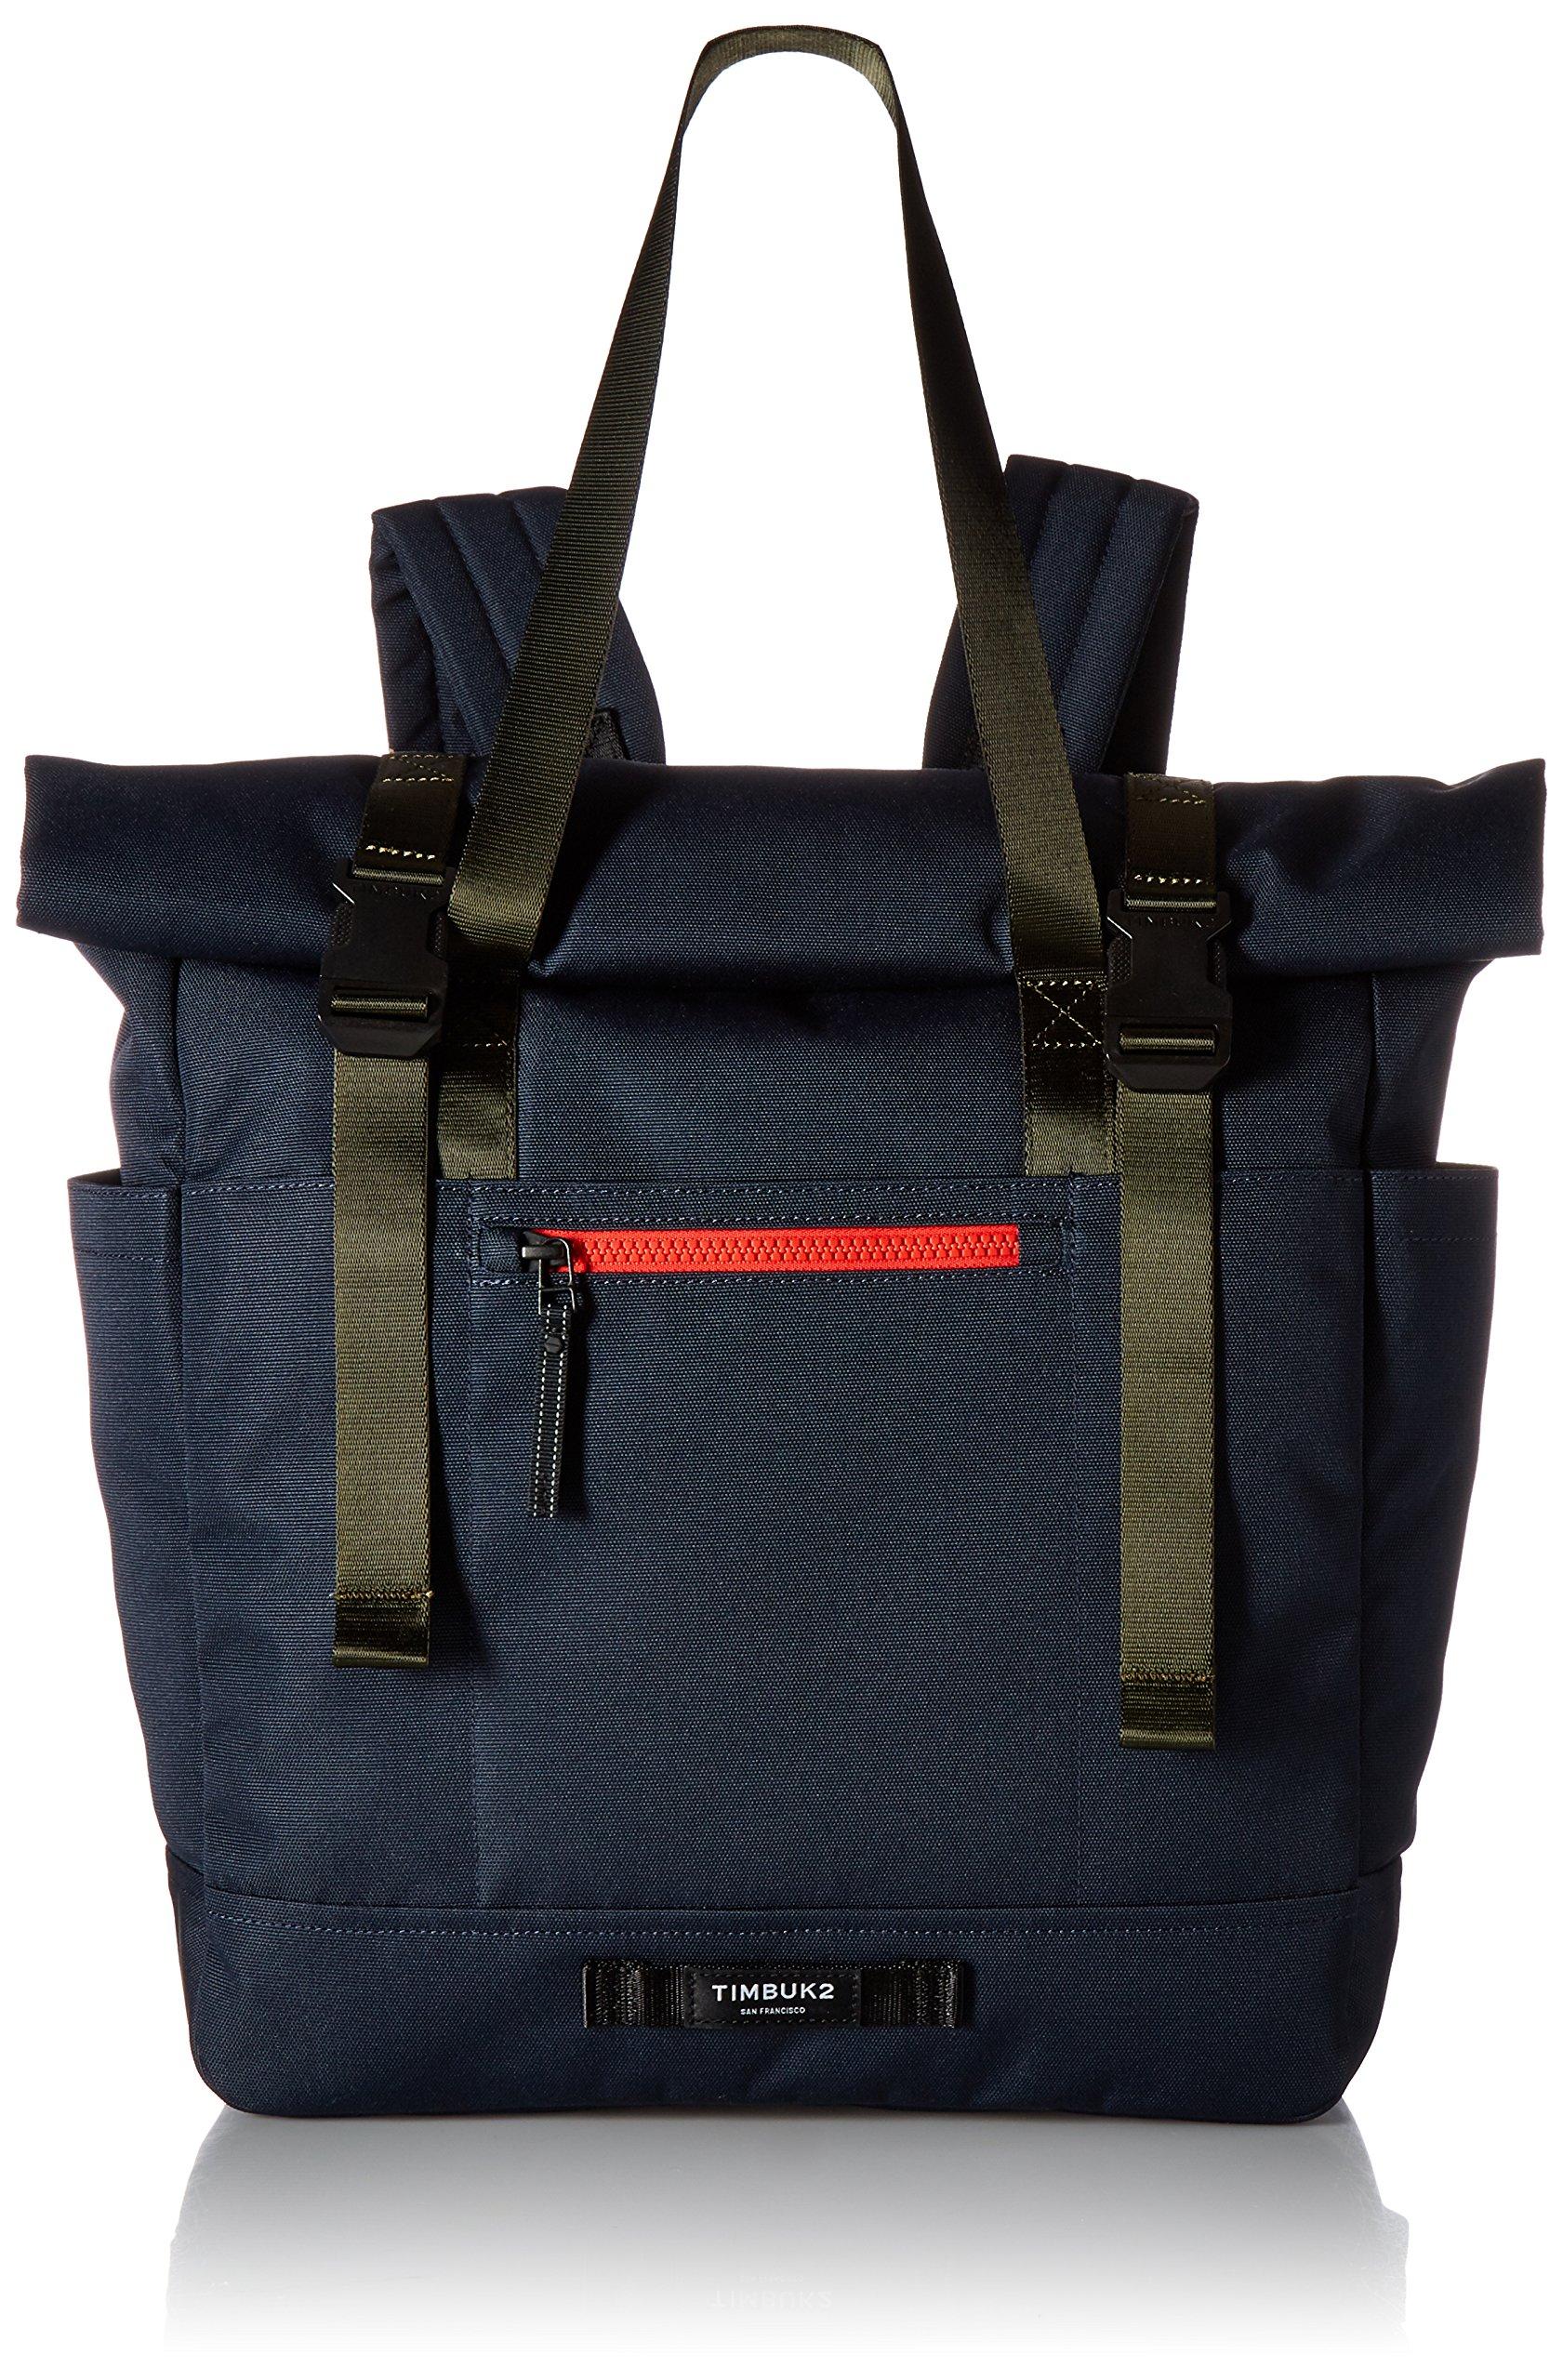 Timbuk2 Forge Tote Bag, Nautical/Bixi, One Size